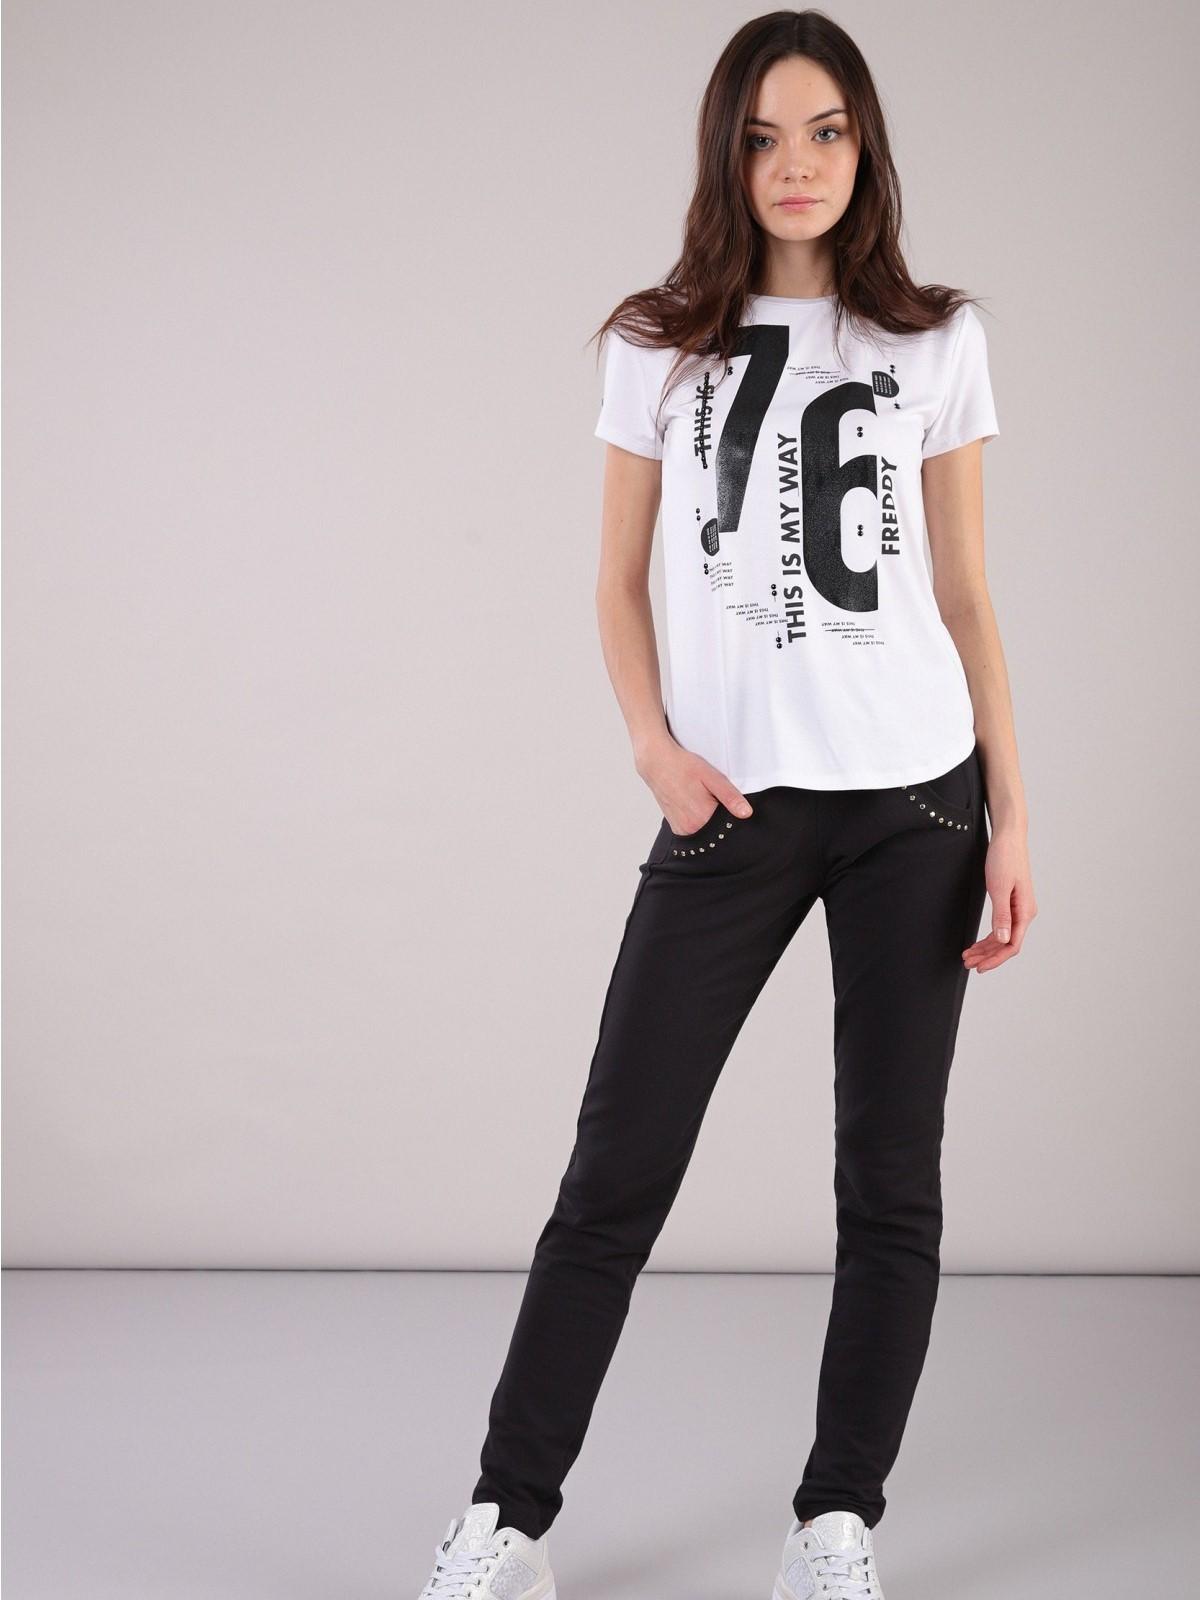 Tシャツ【全2色】